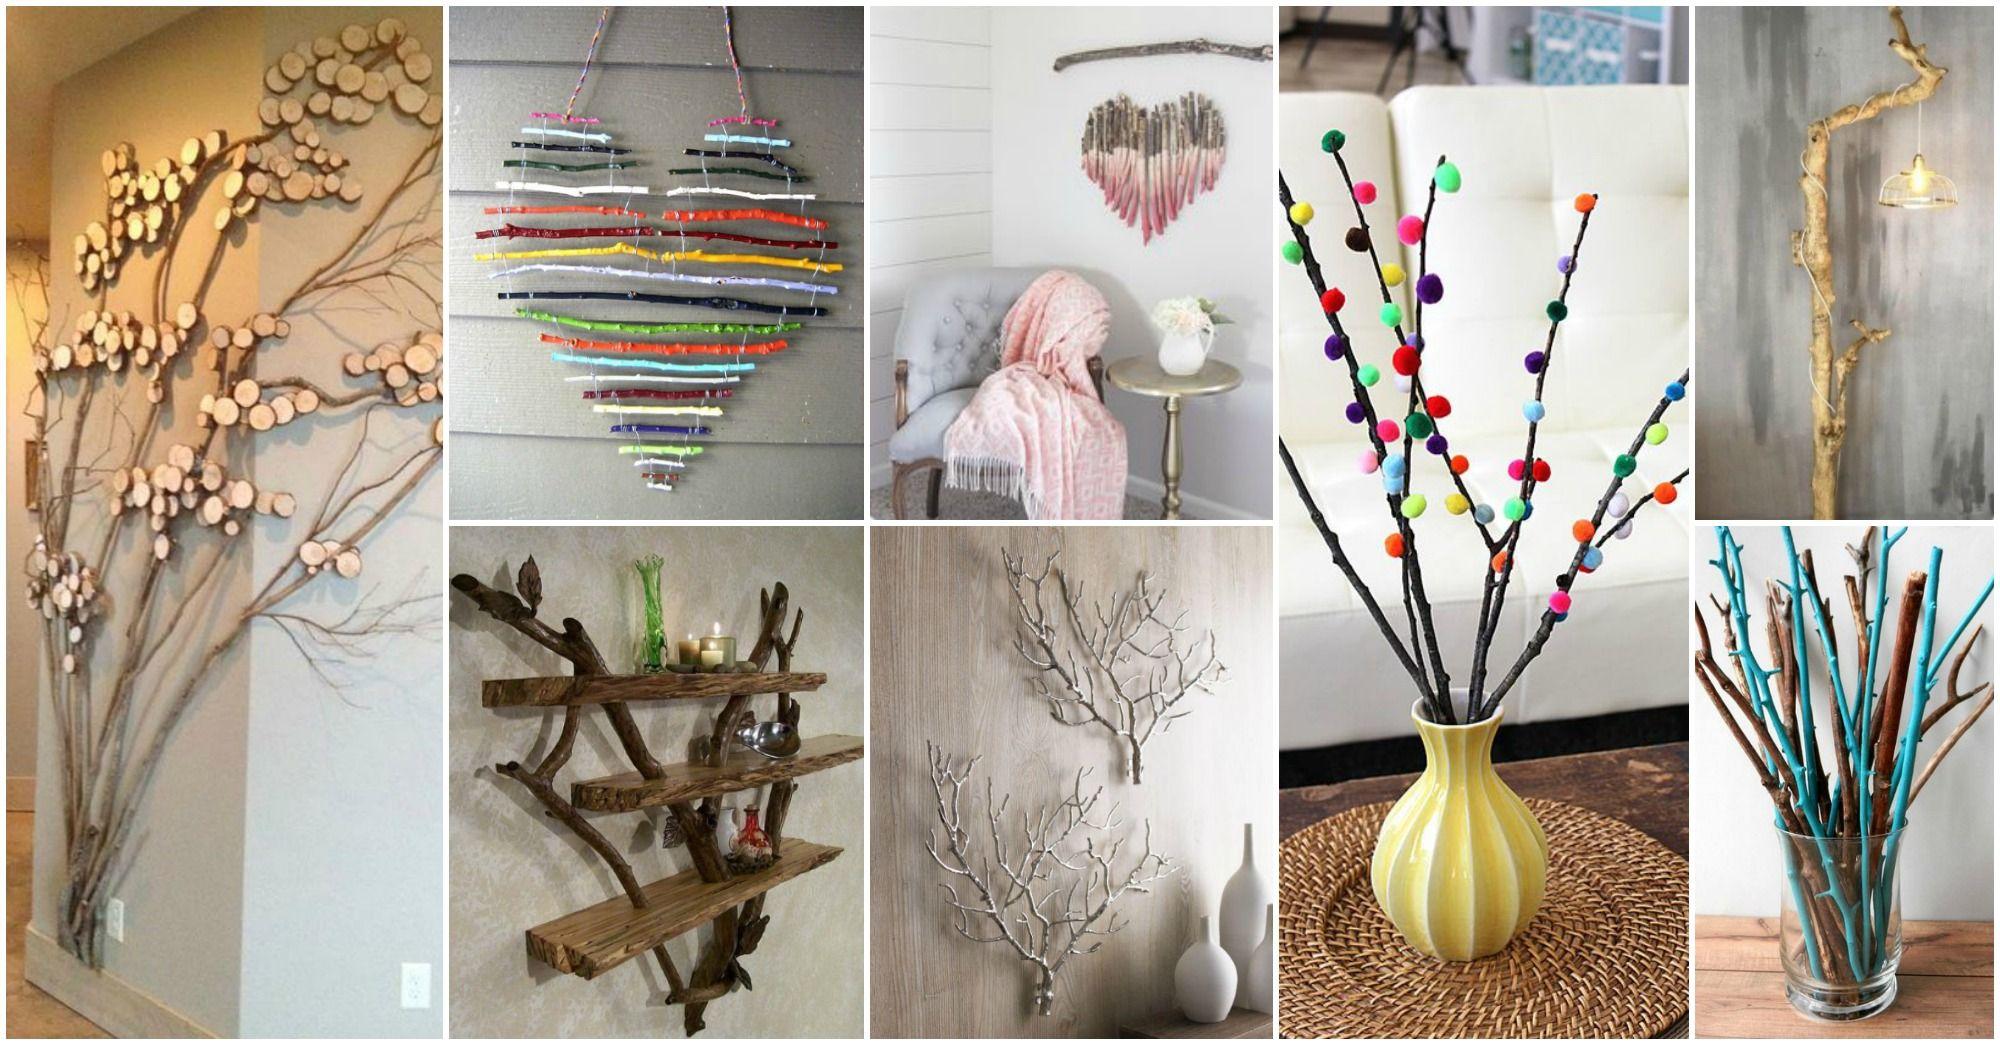 Diy Tree Branches Home Decor Ideas Tree Branch Decor Tree Branch Decor Diy Handmade Home Decor